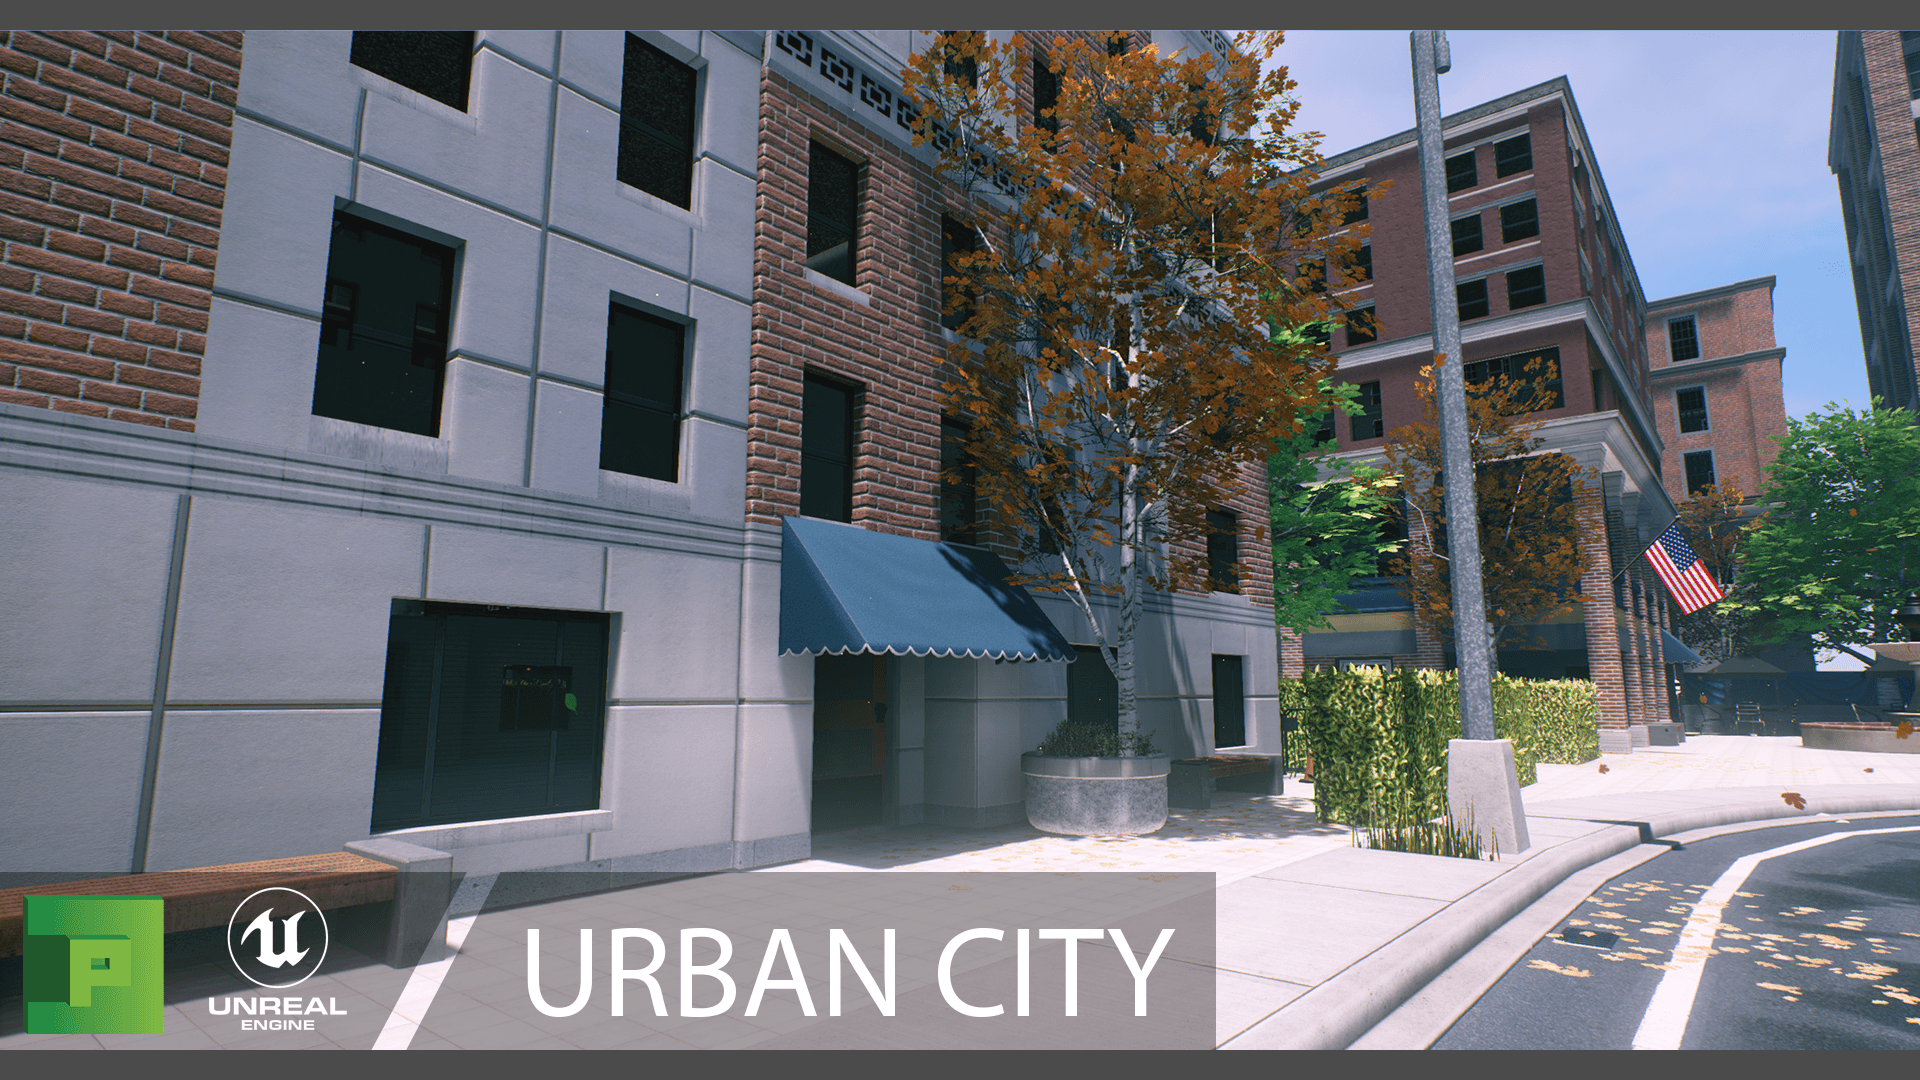 UrbanCity_01